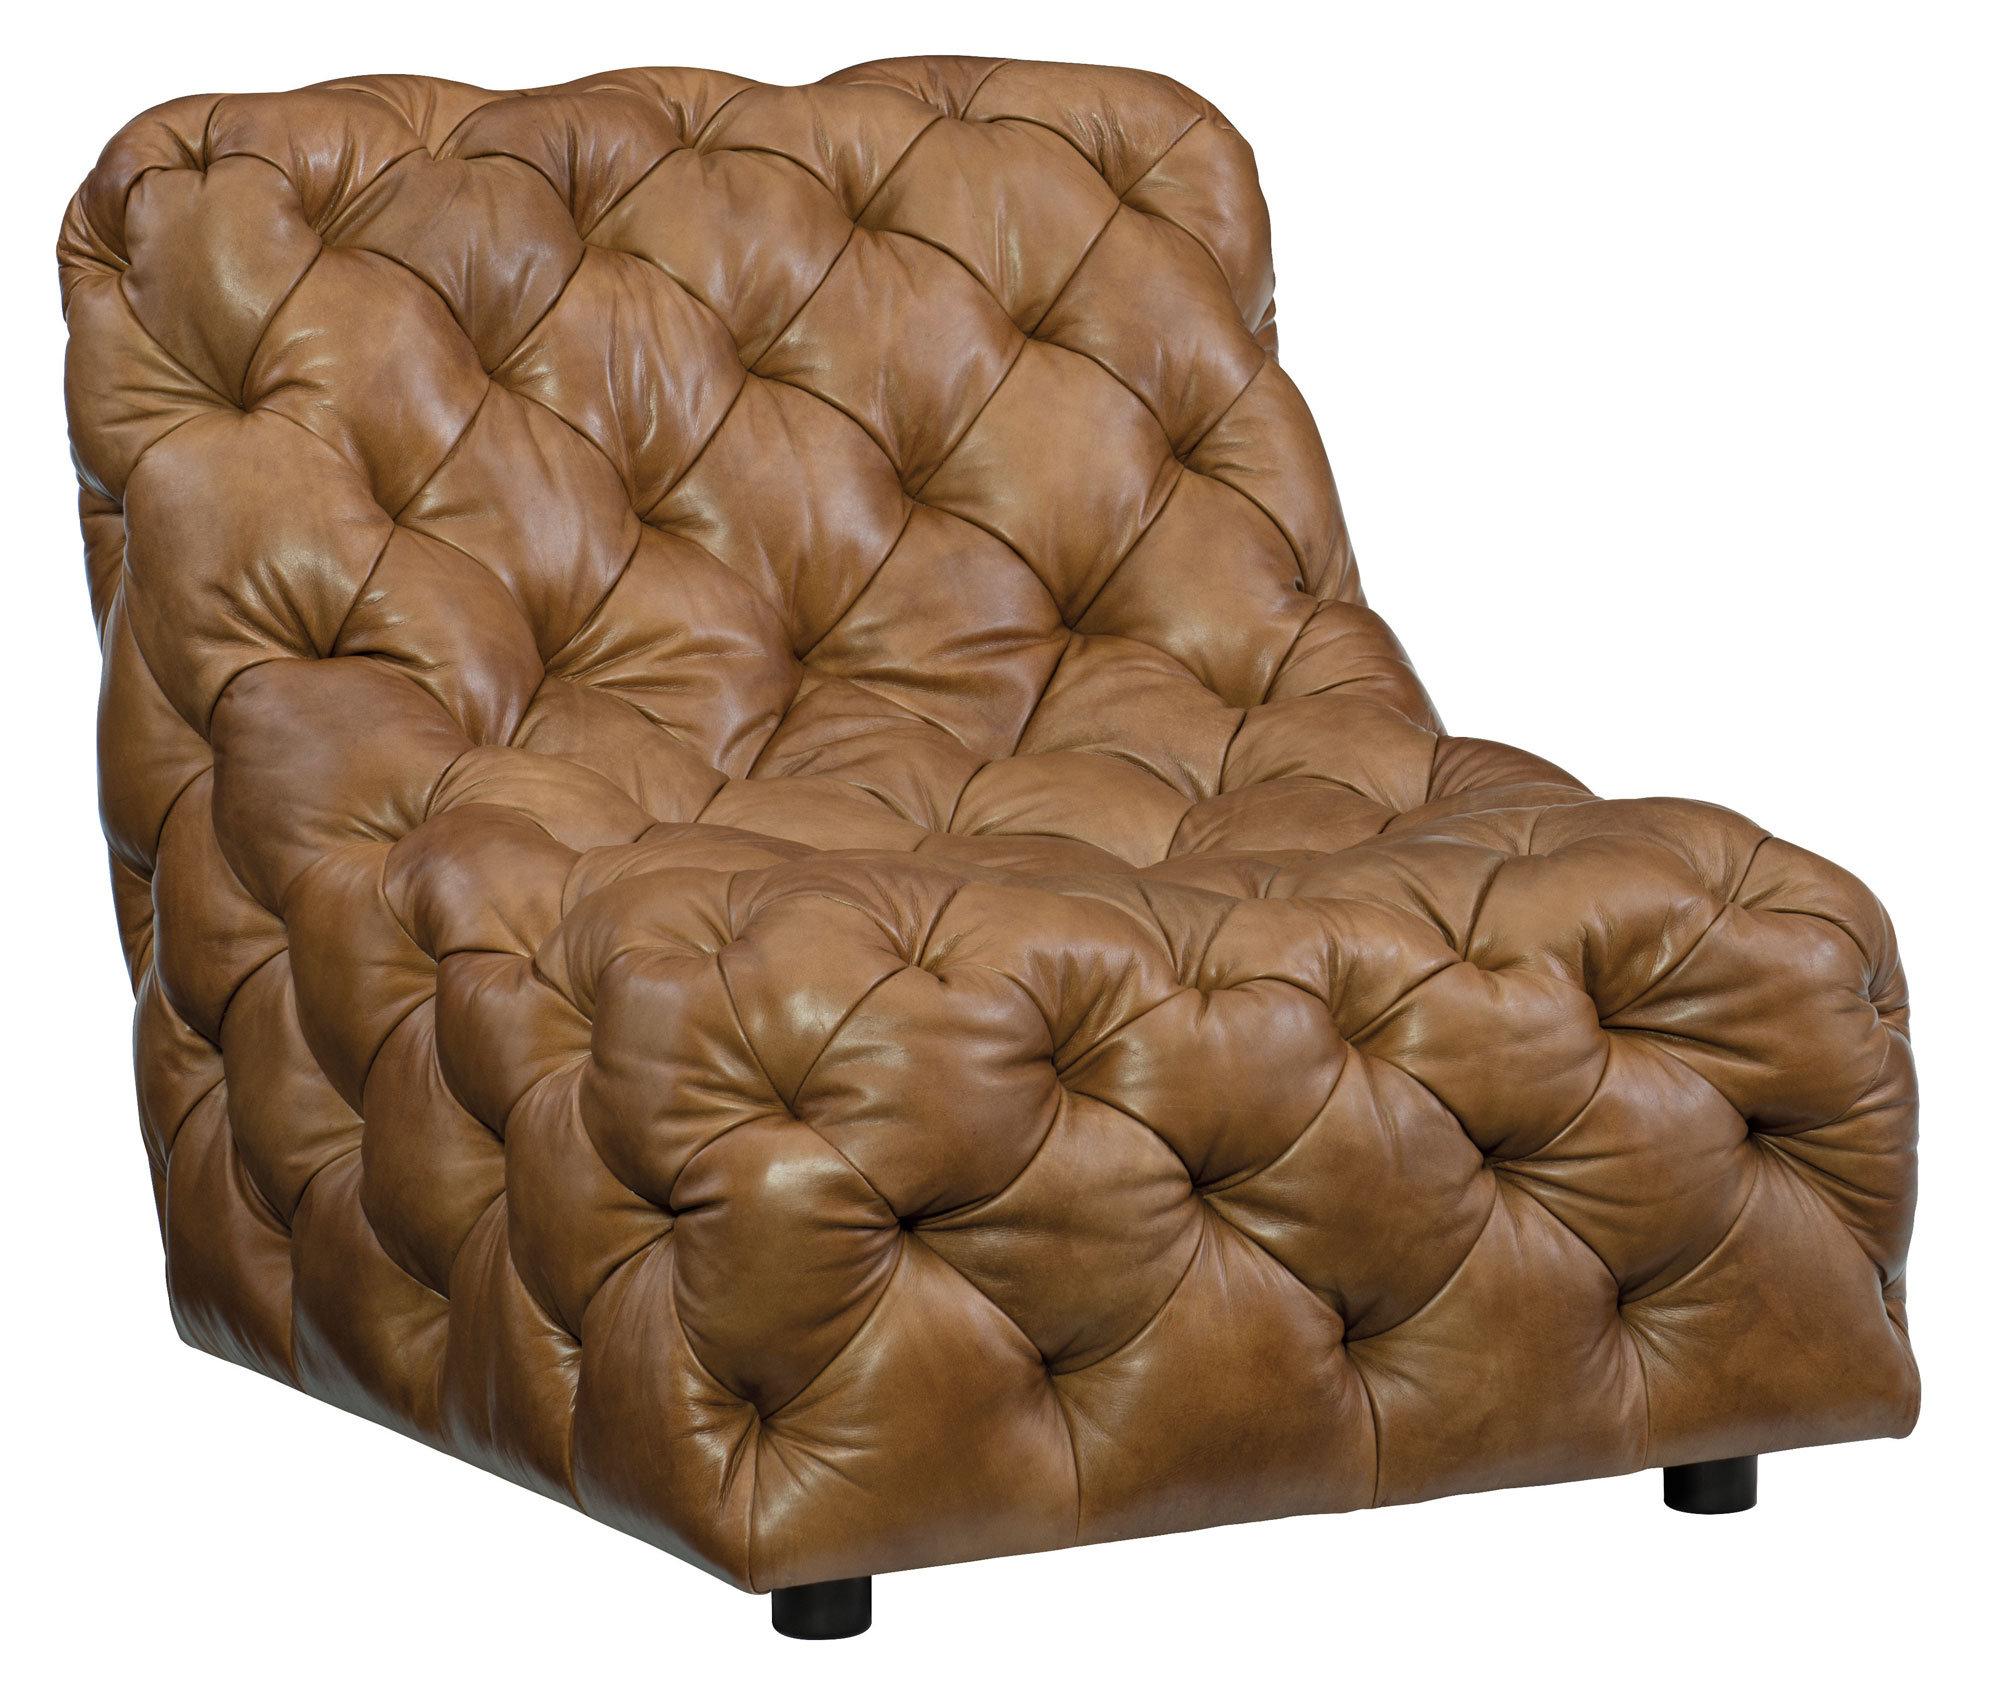 Superb Rigby Slipper Chair Creativecarmelina Interior Chair Design Creativecarmelinacom